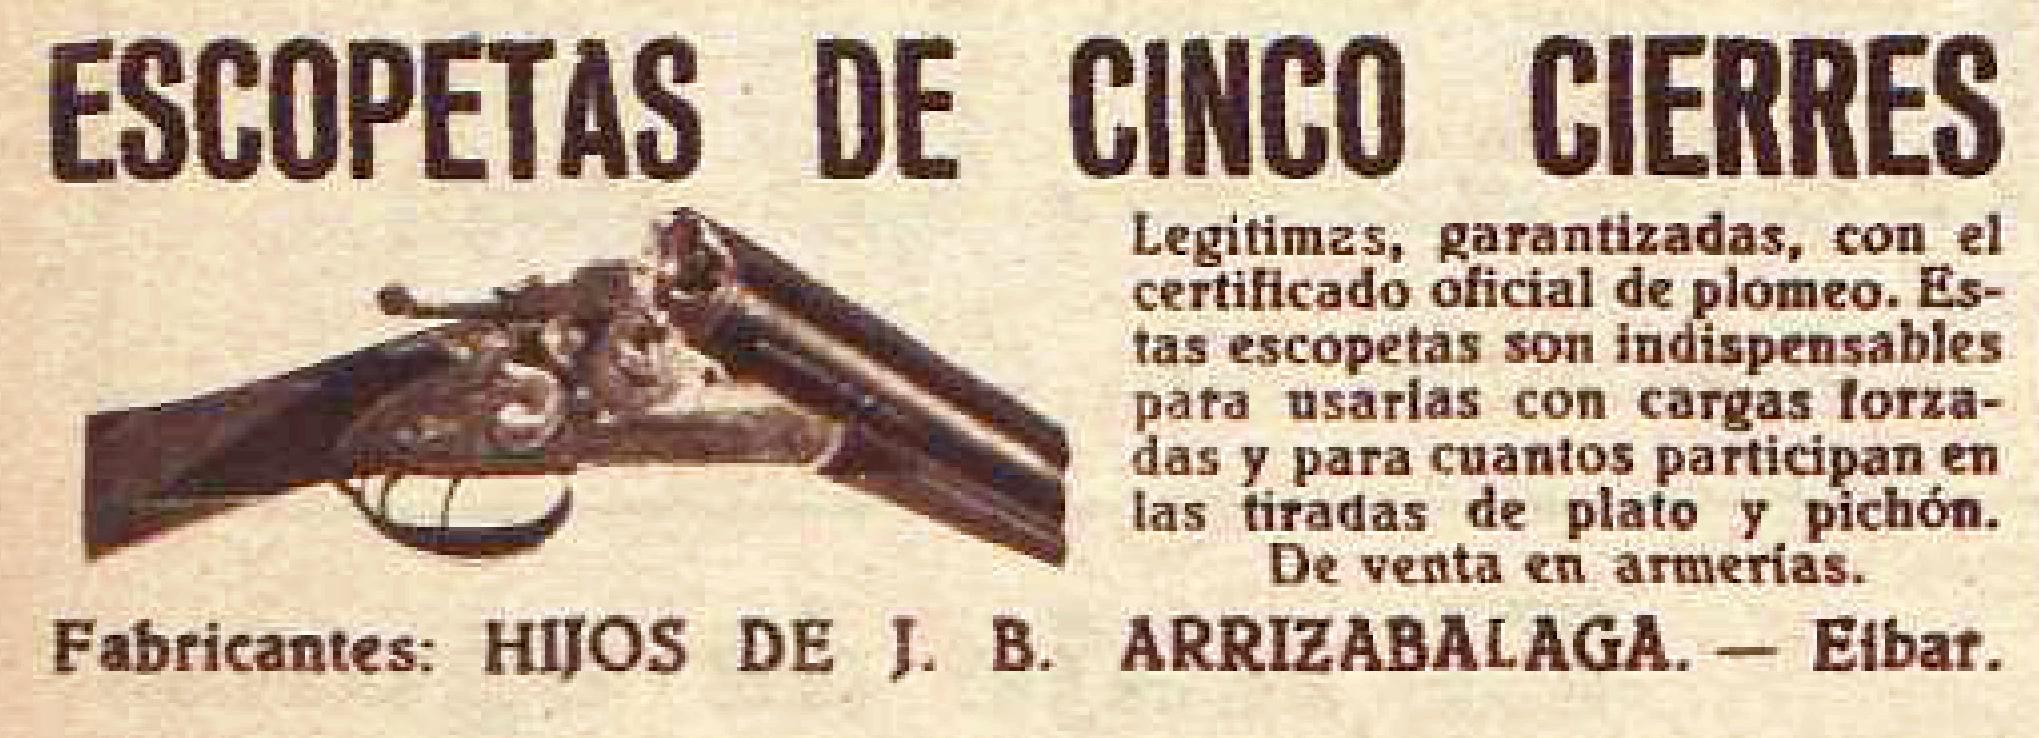 cronica5-1-1936